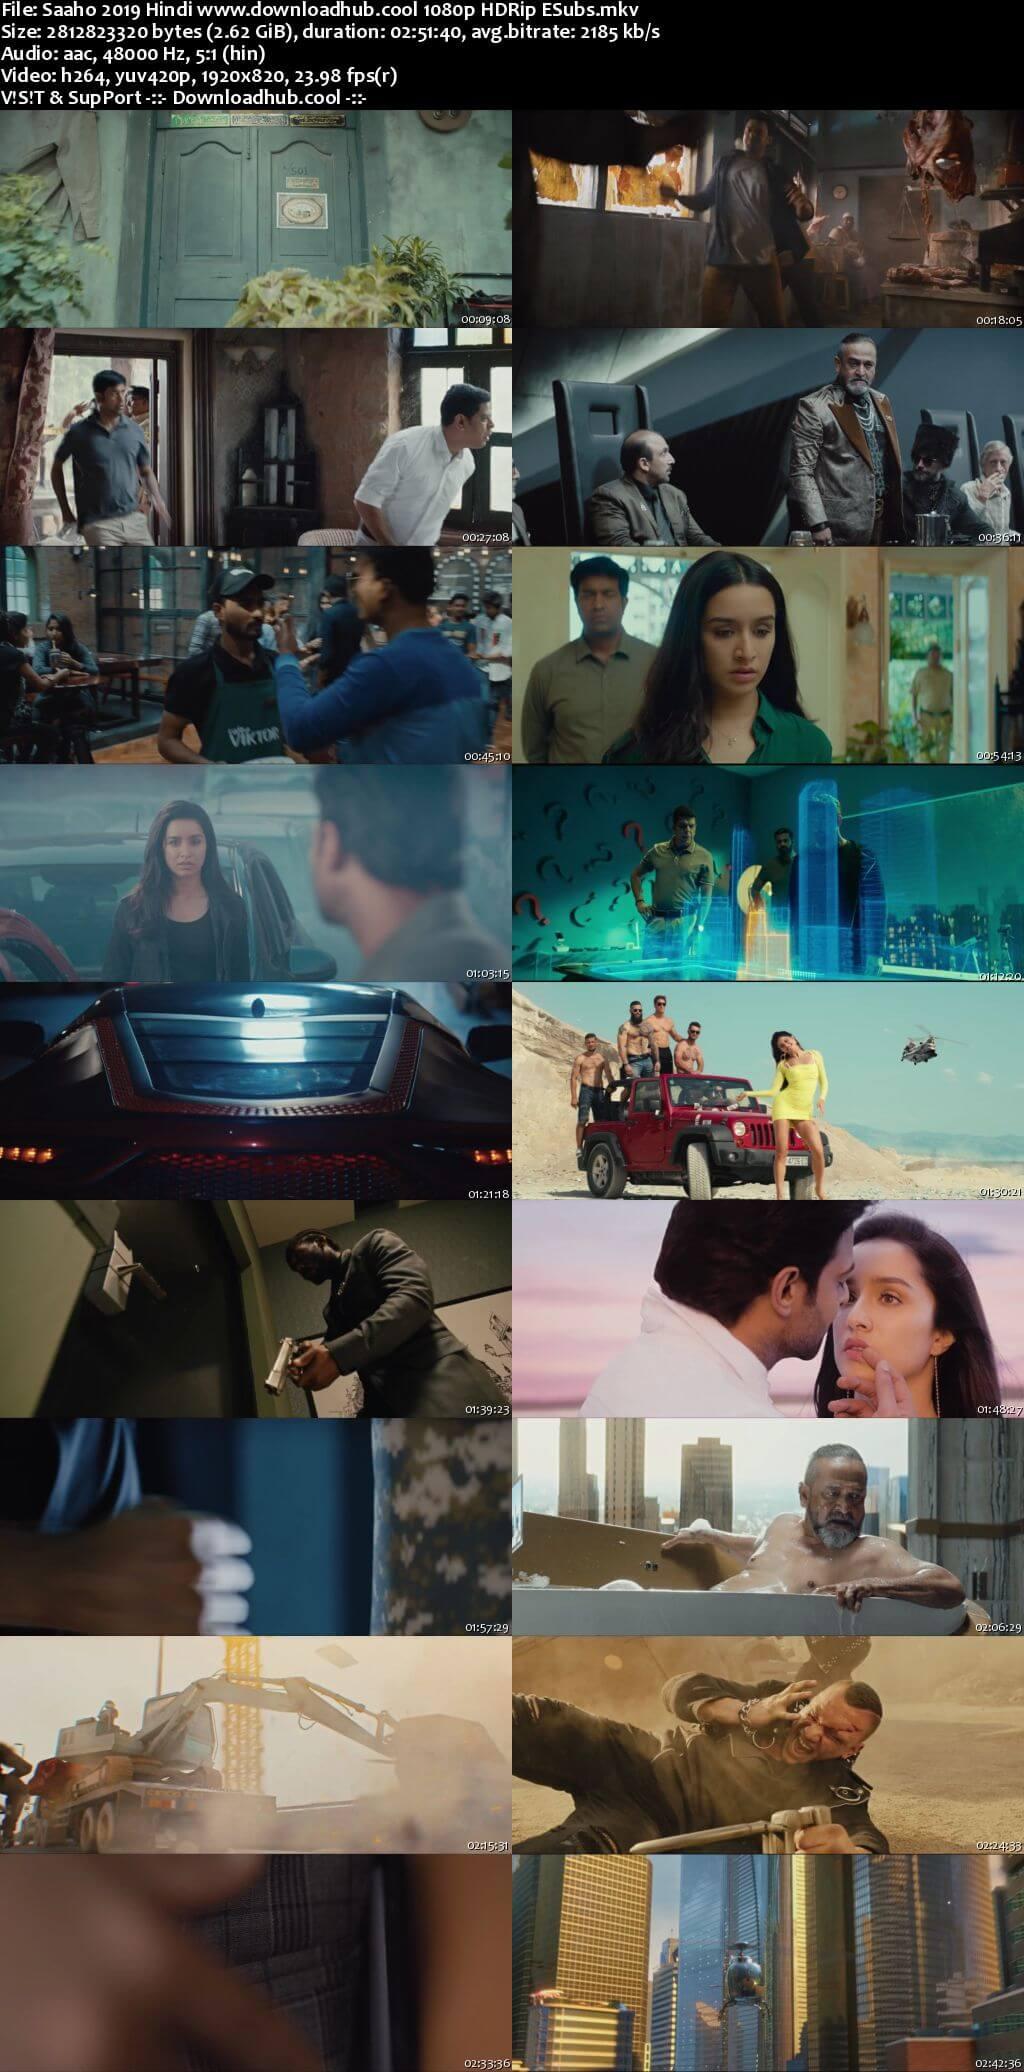 Saaho 2019 Hindi 1080p HDRip ESubs